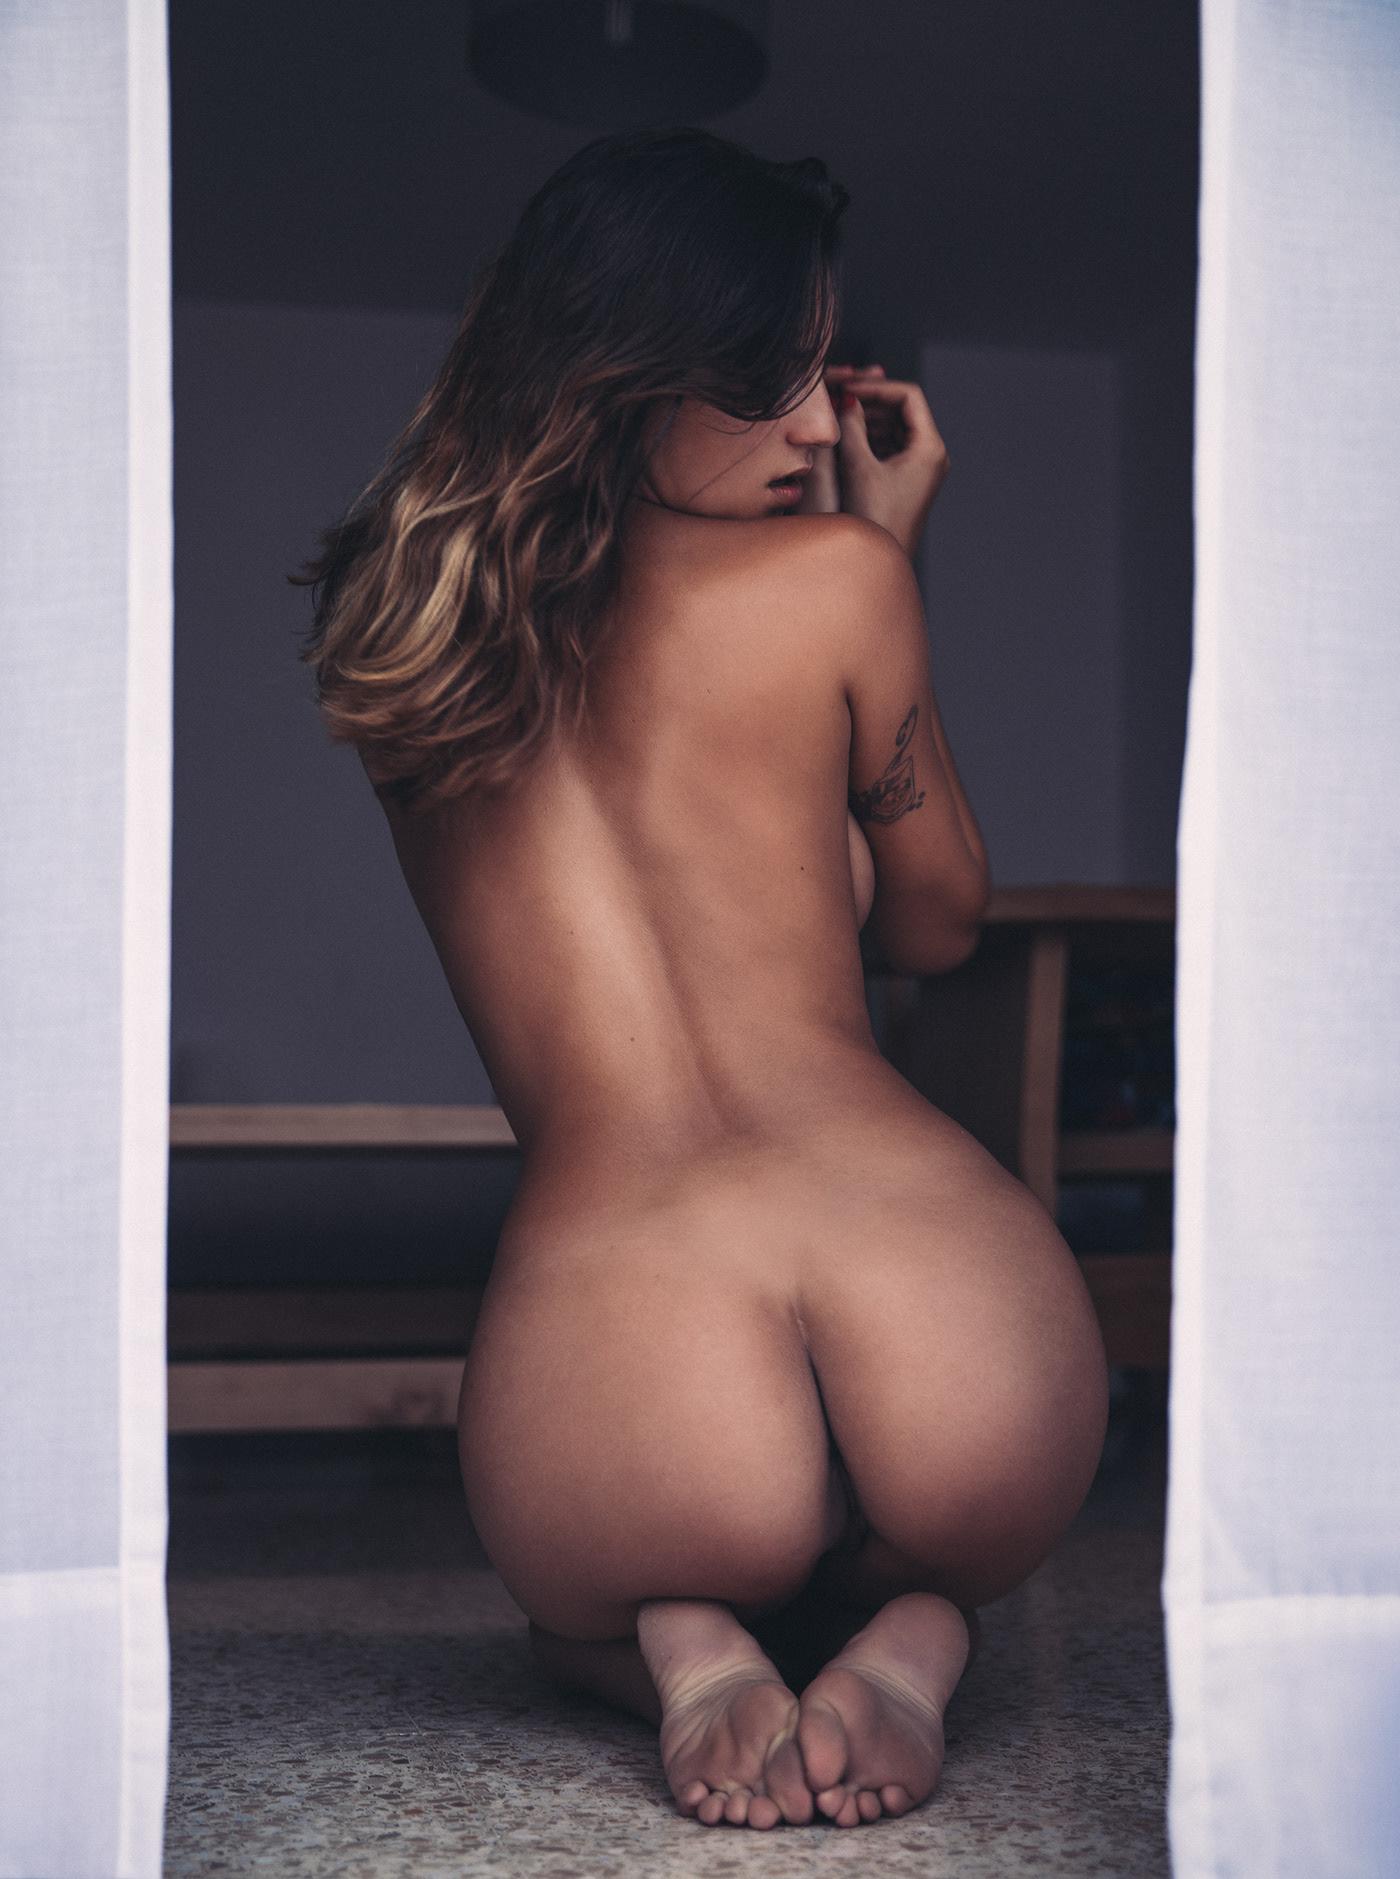 Lara in the window / фотограф Thomas Agatz